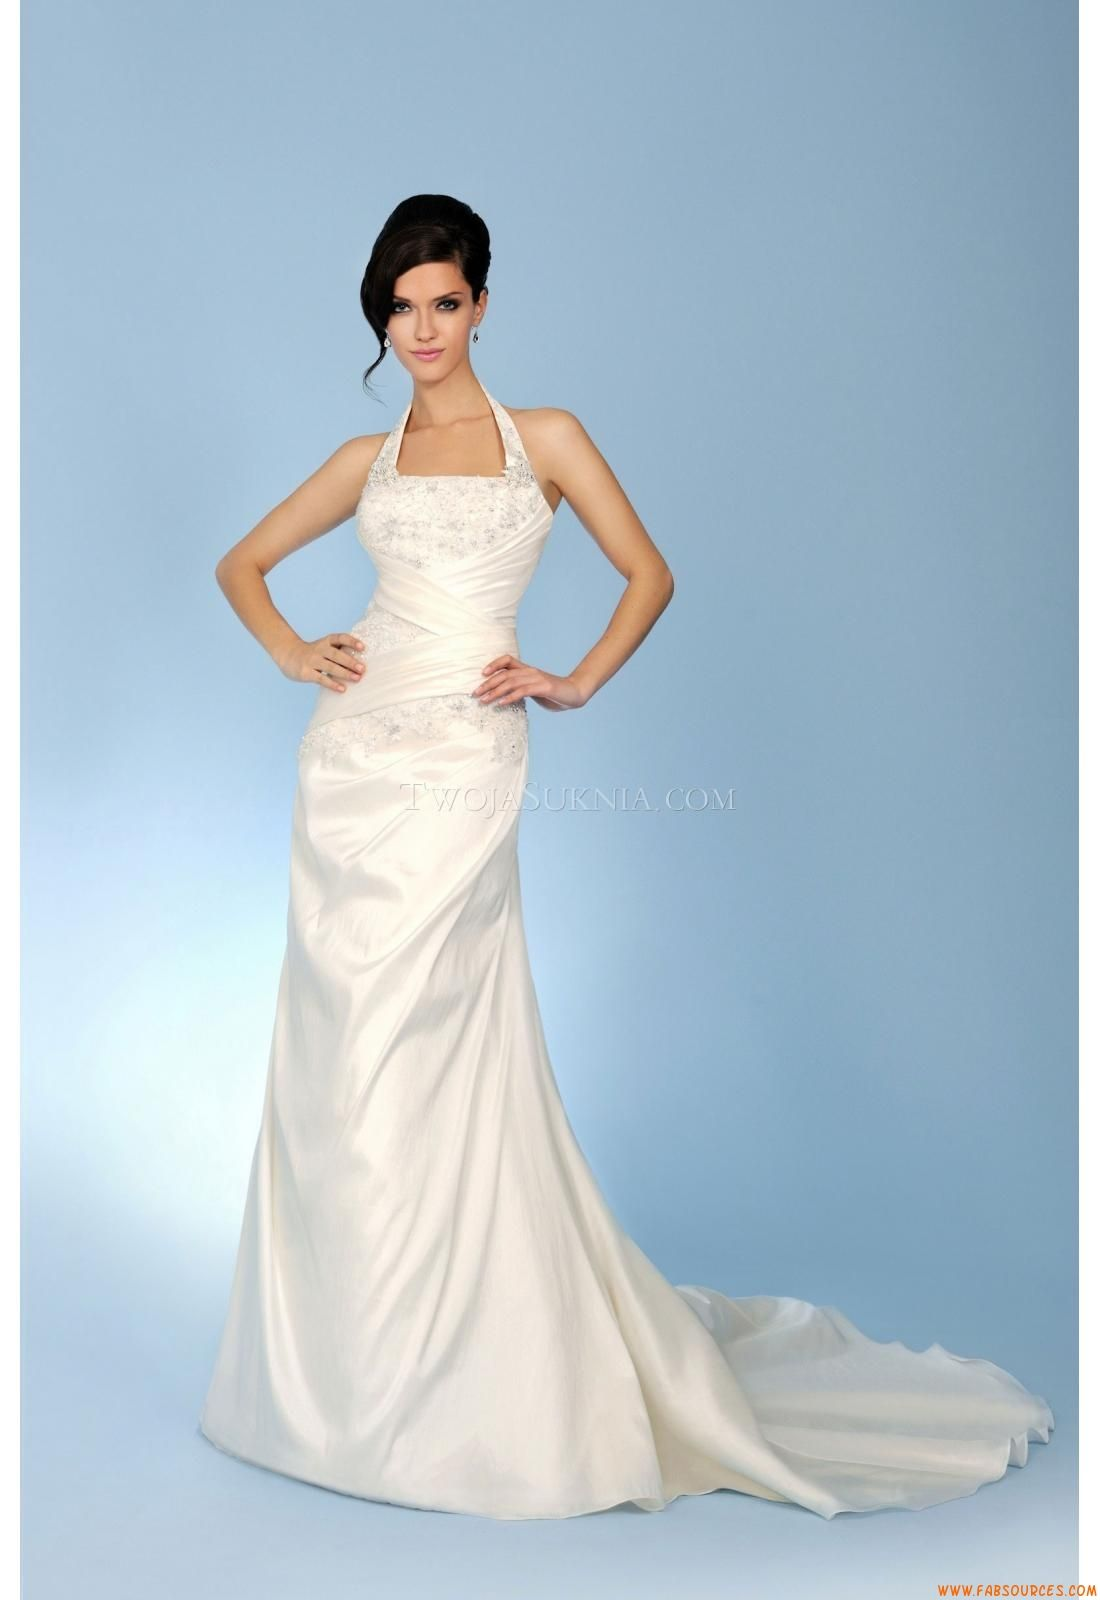 Robes de mariée Trudy Lee 58131 2013 | Inspiration mariage ...